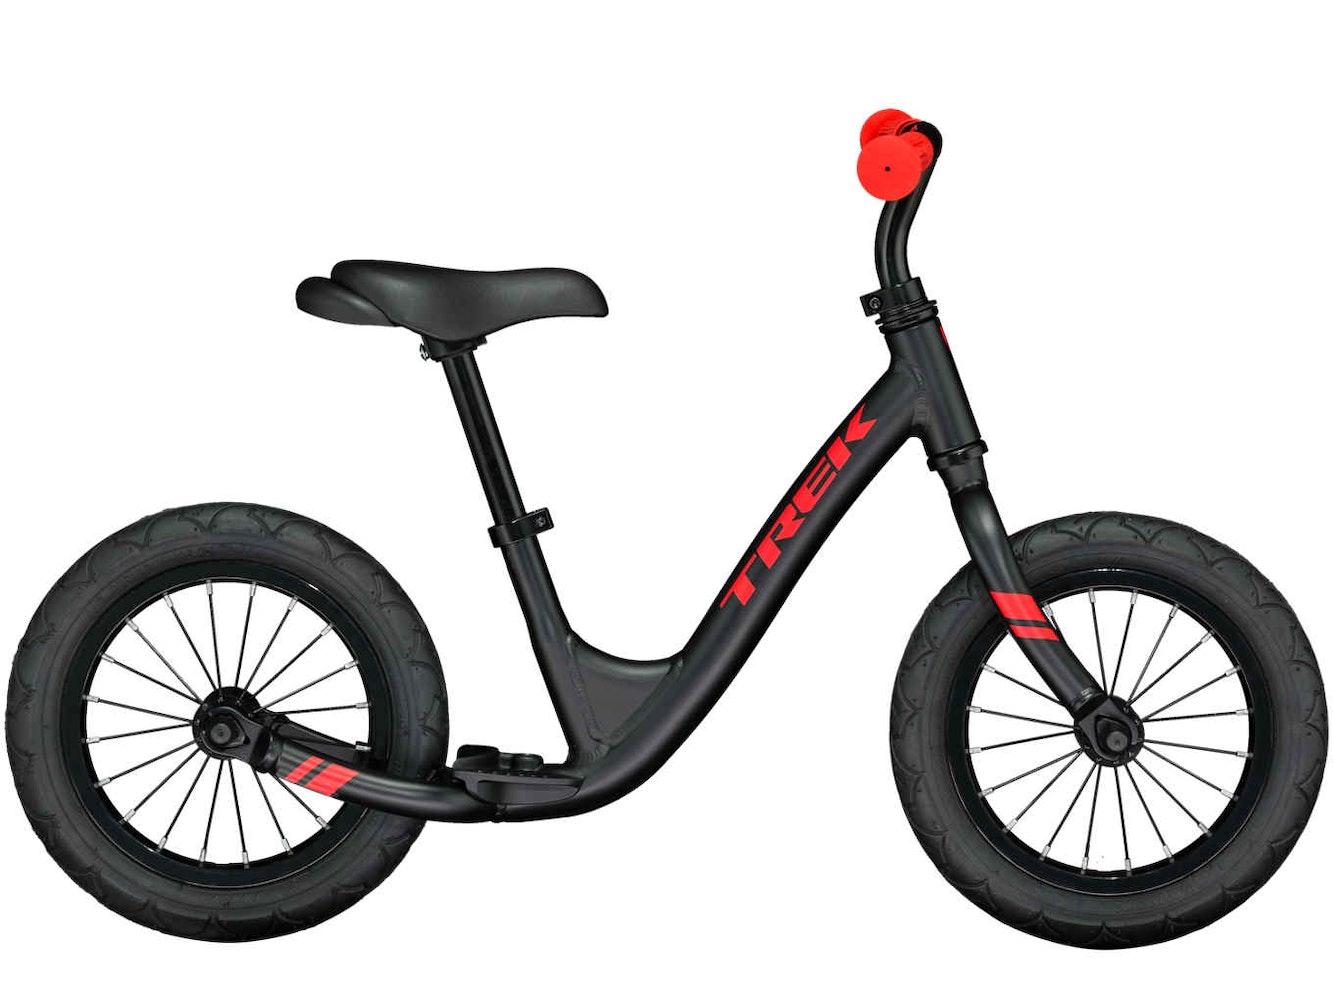 Announcing The Coolest Bike In Triathlon Contest Winner